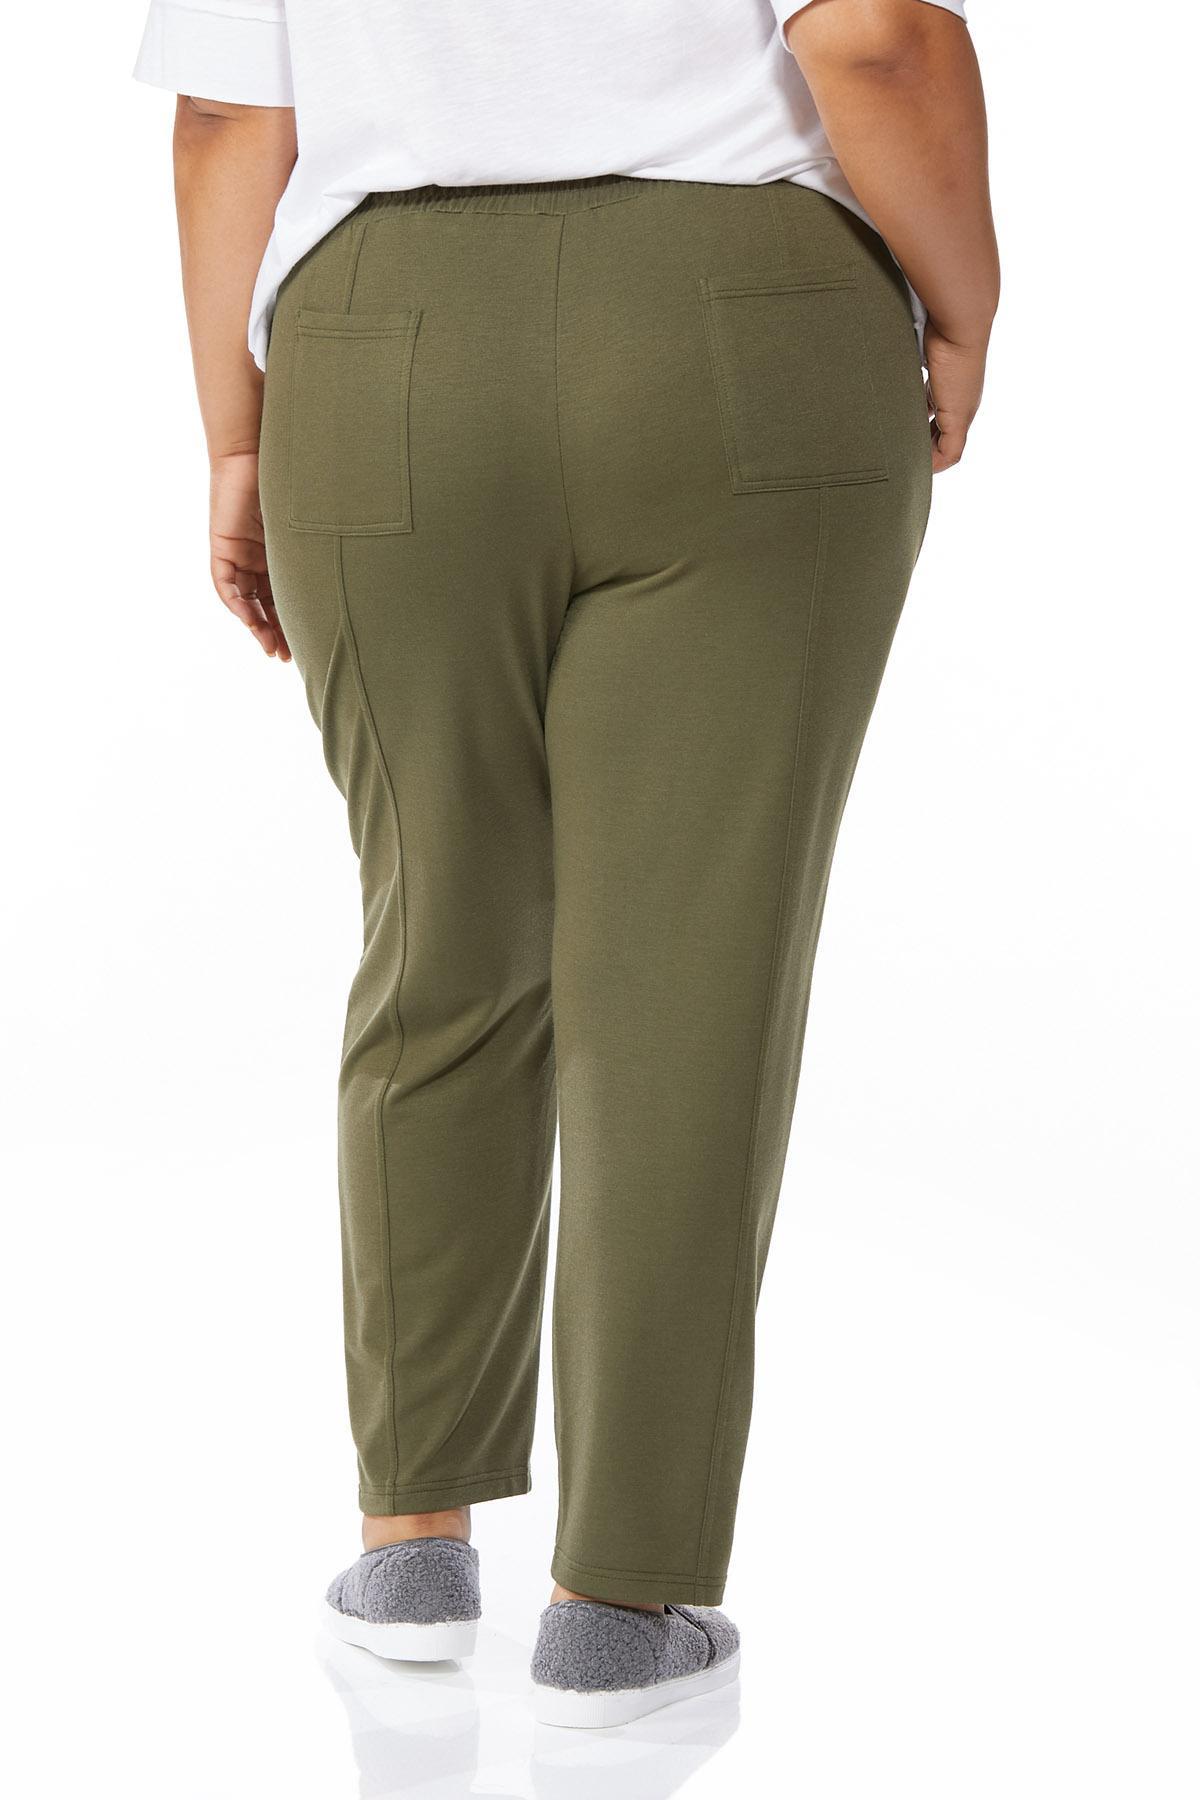 Plus Petite Soft Olive Pants (Item #44655286)